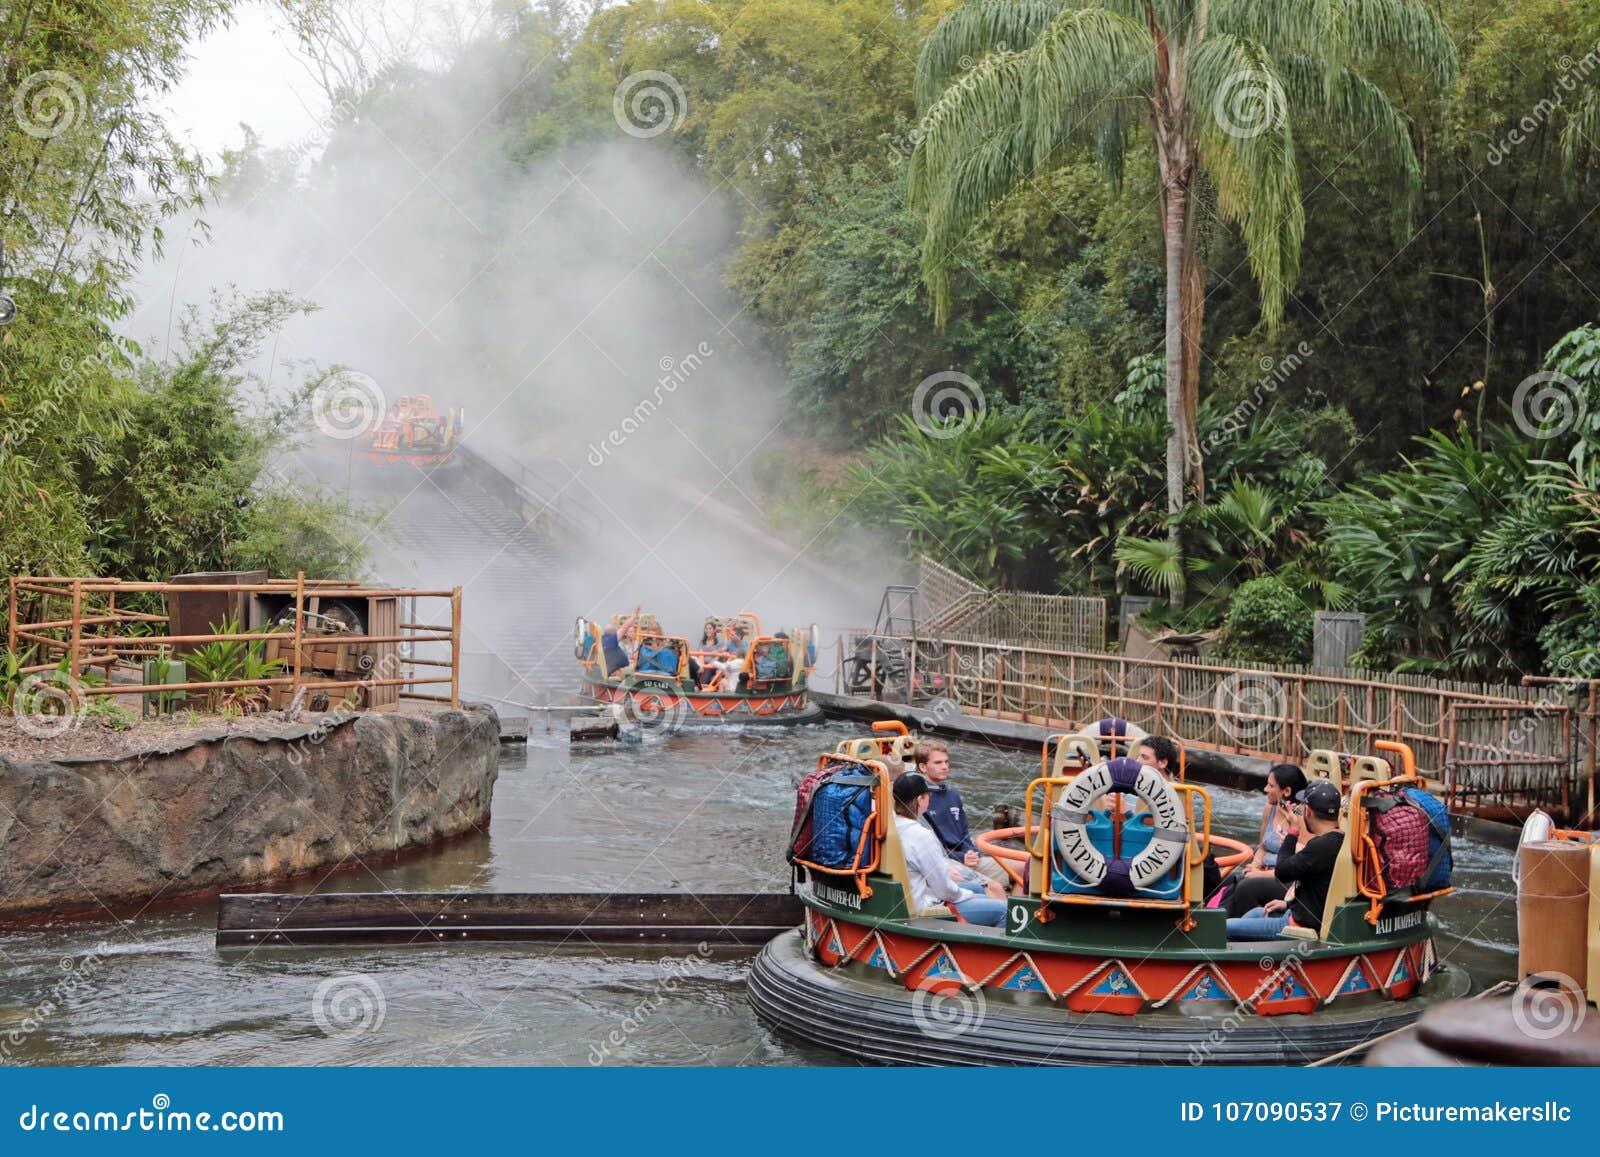 Kali River Rapids, Walt Disney World